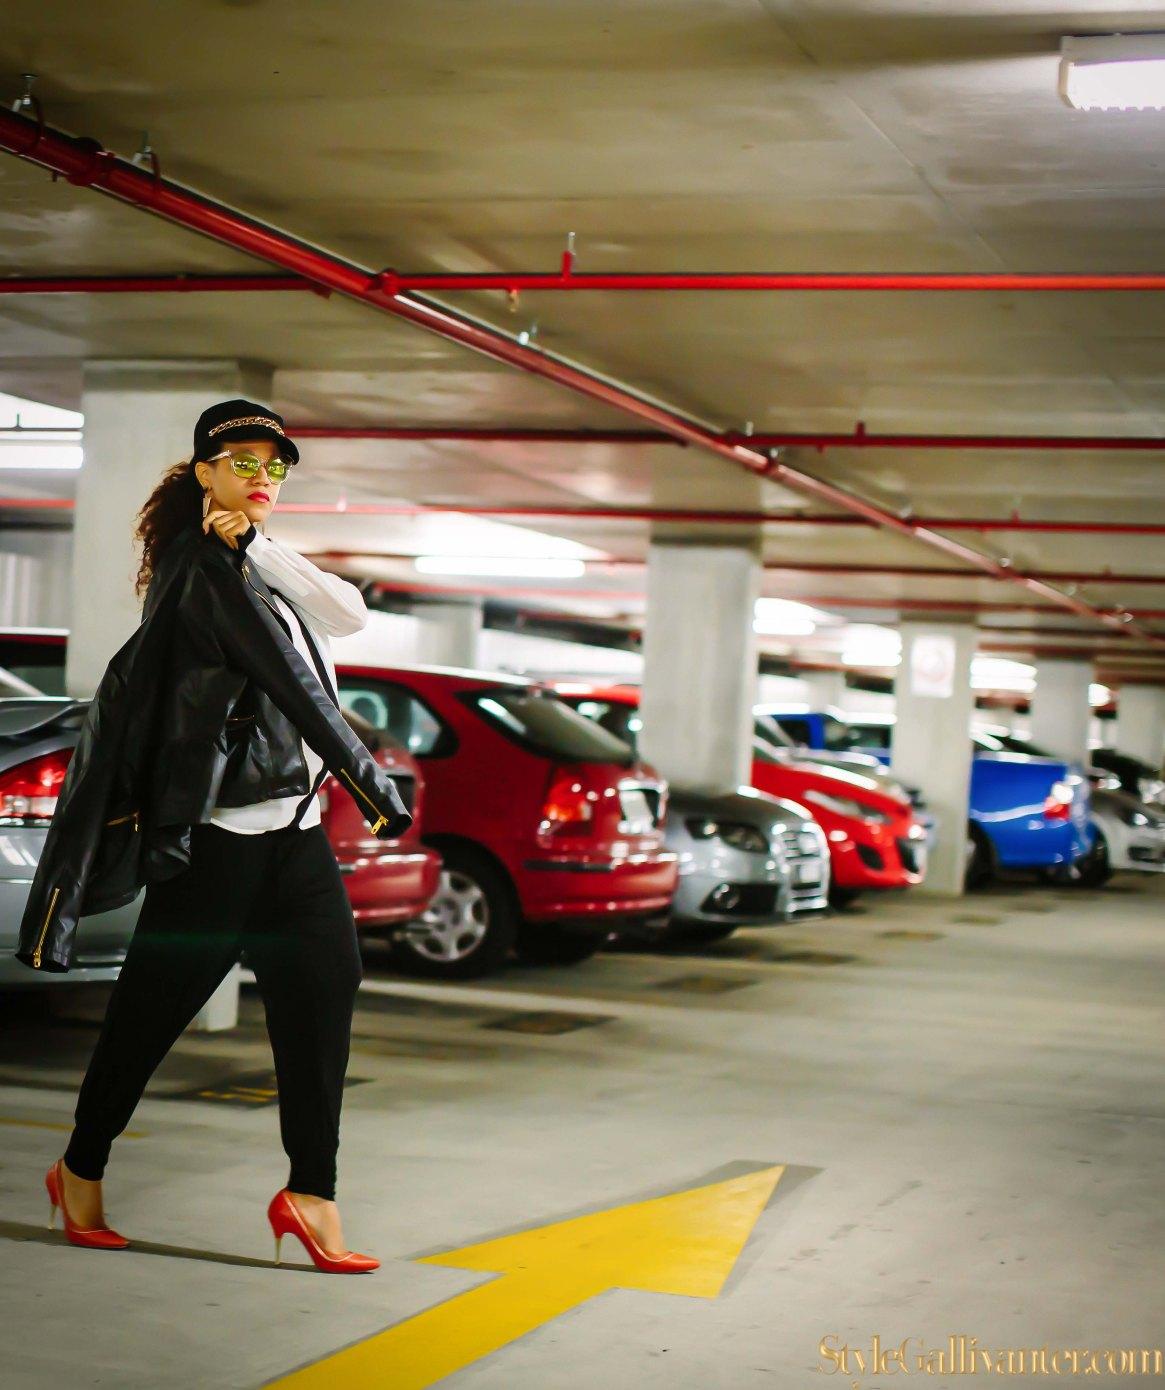 pretty-girl-rock_kerry-hison-style_rihanna-fashion-style-2014_top-fashion-style-bloggers-melbourne_australia's-top-stylists_australias-top-personal-style-fashion-blogs_vogue-2014-20